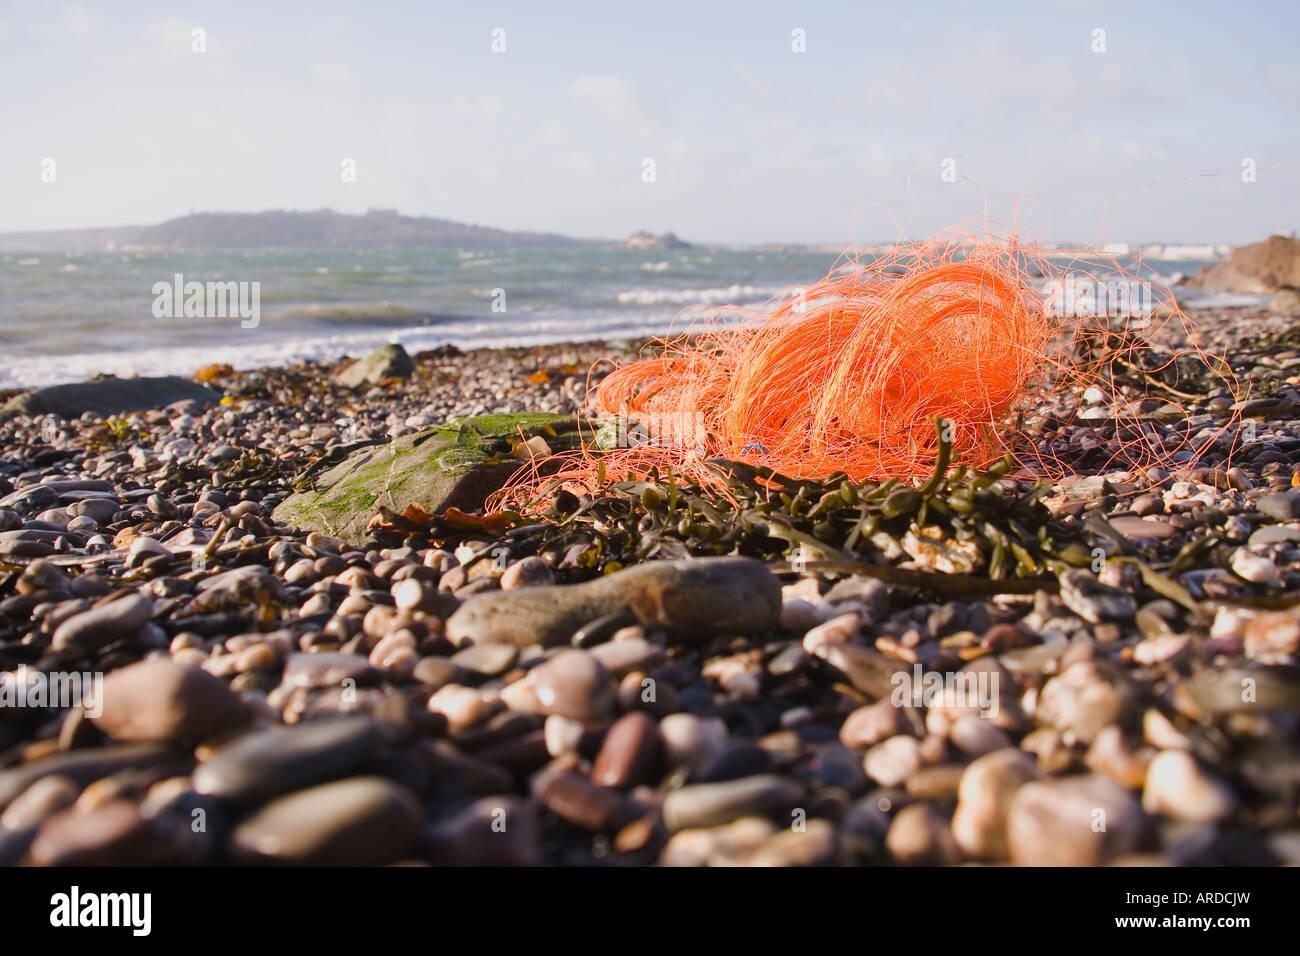 Rubbish on a beach - Stock Image